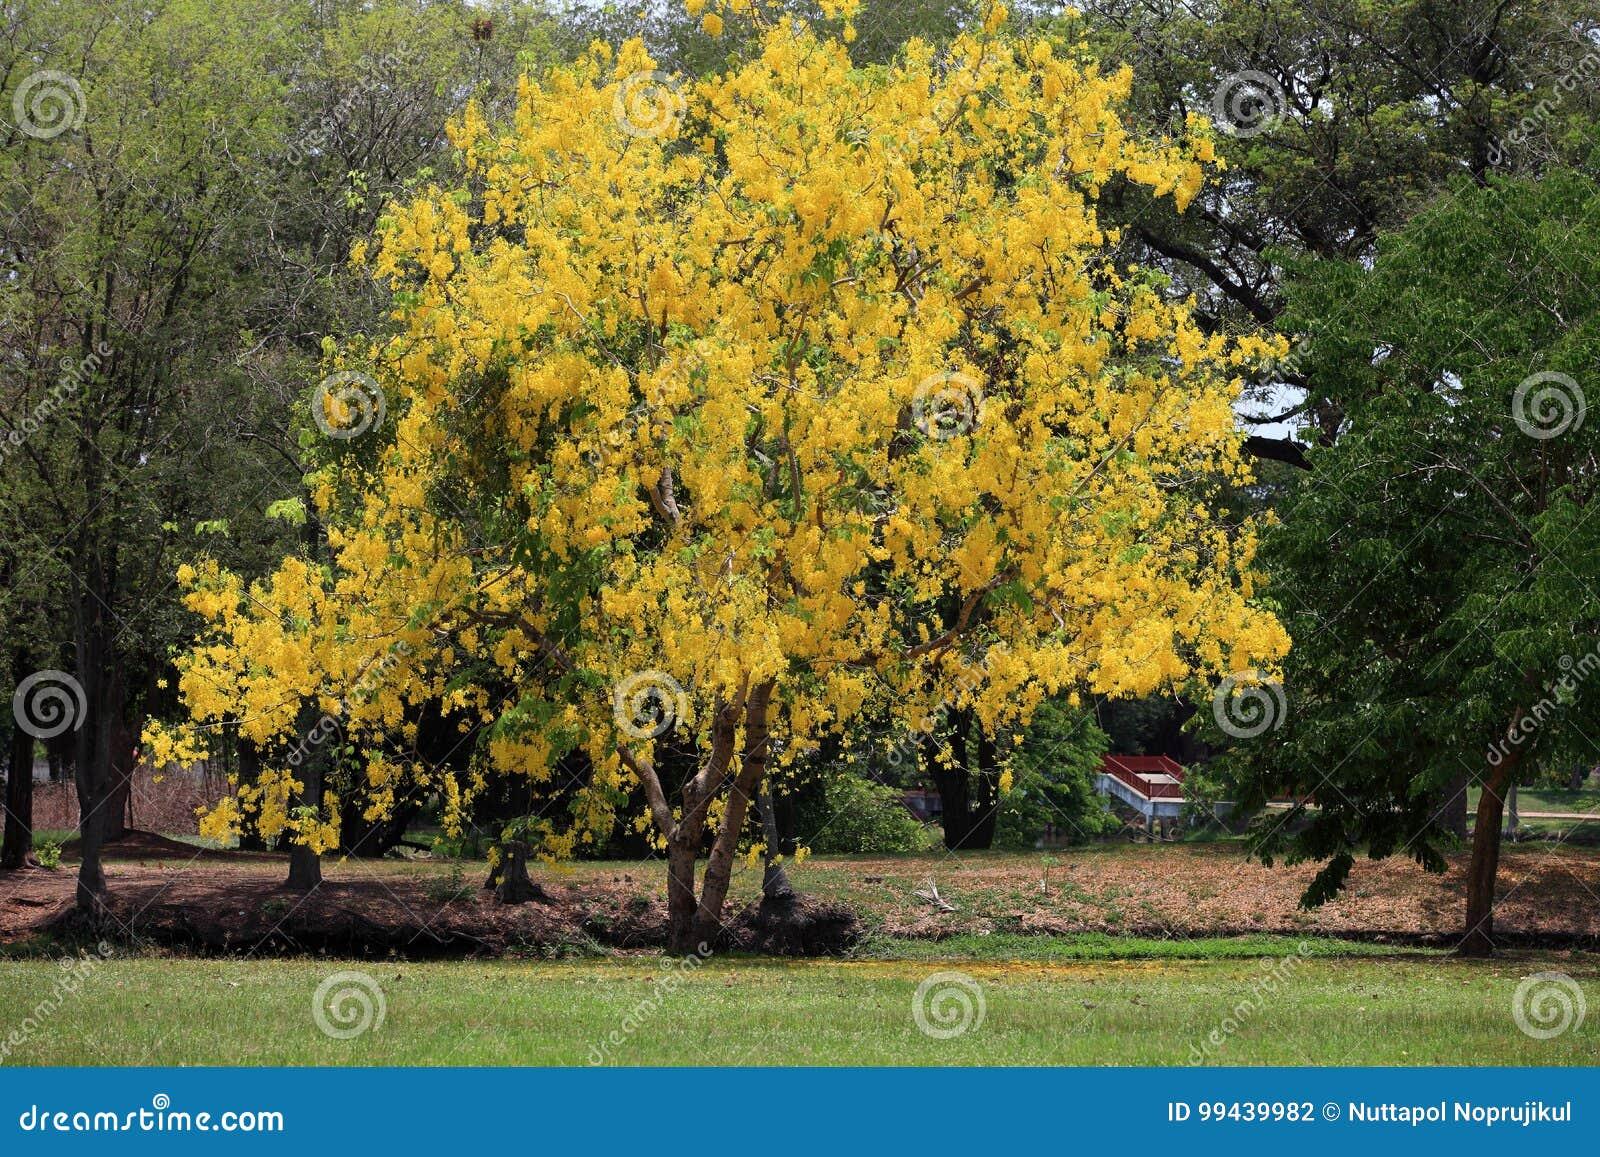 Yellow Flowers In Bloom Summer Golden Shower Tree Stock Photo